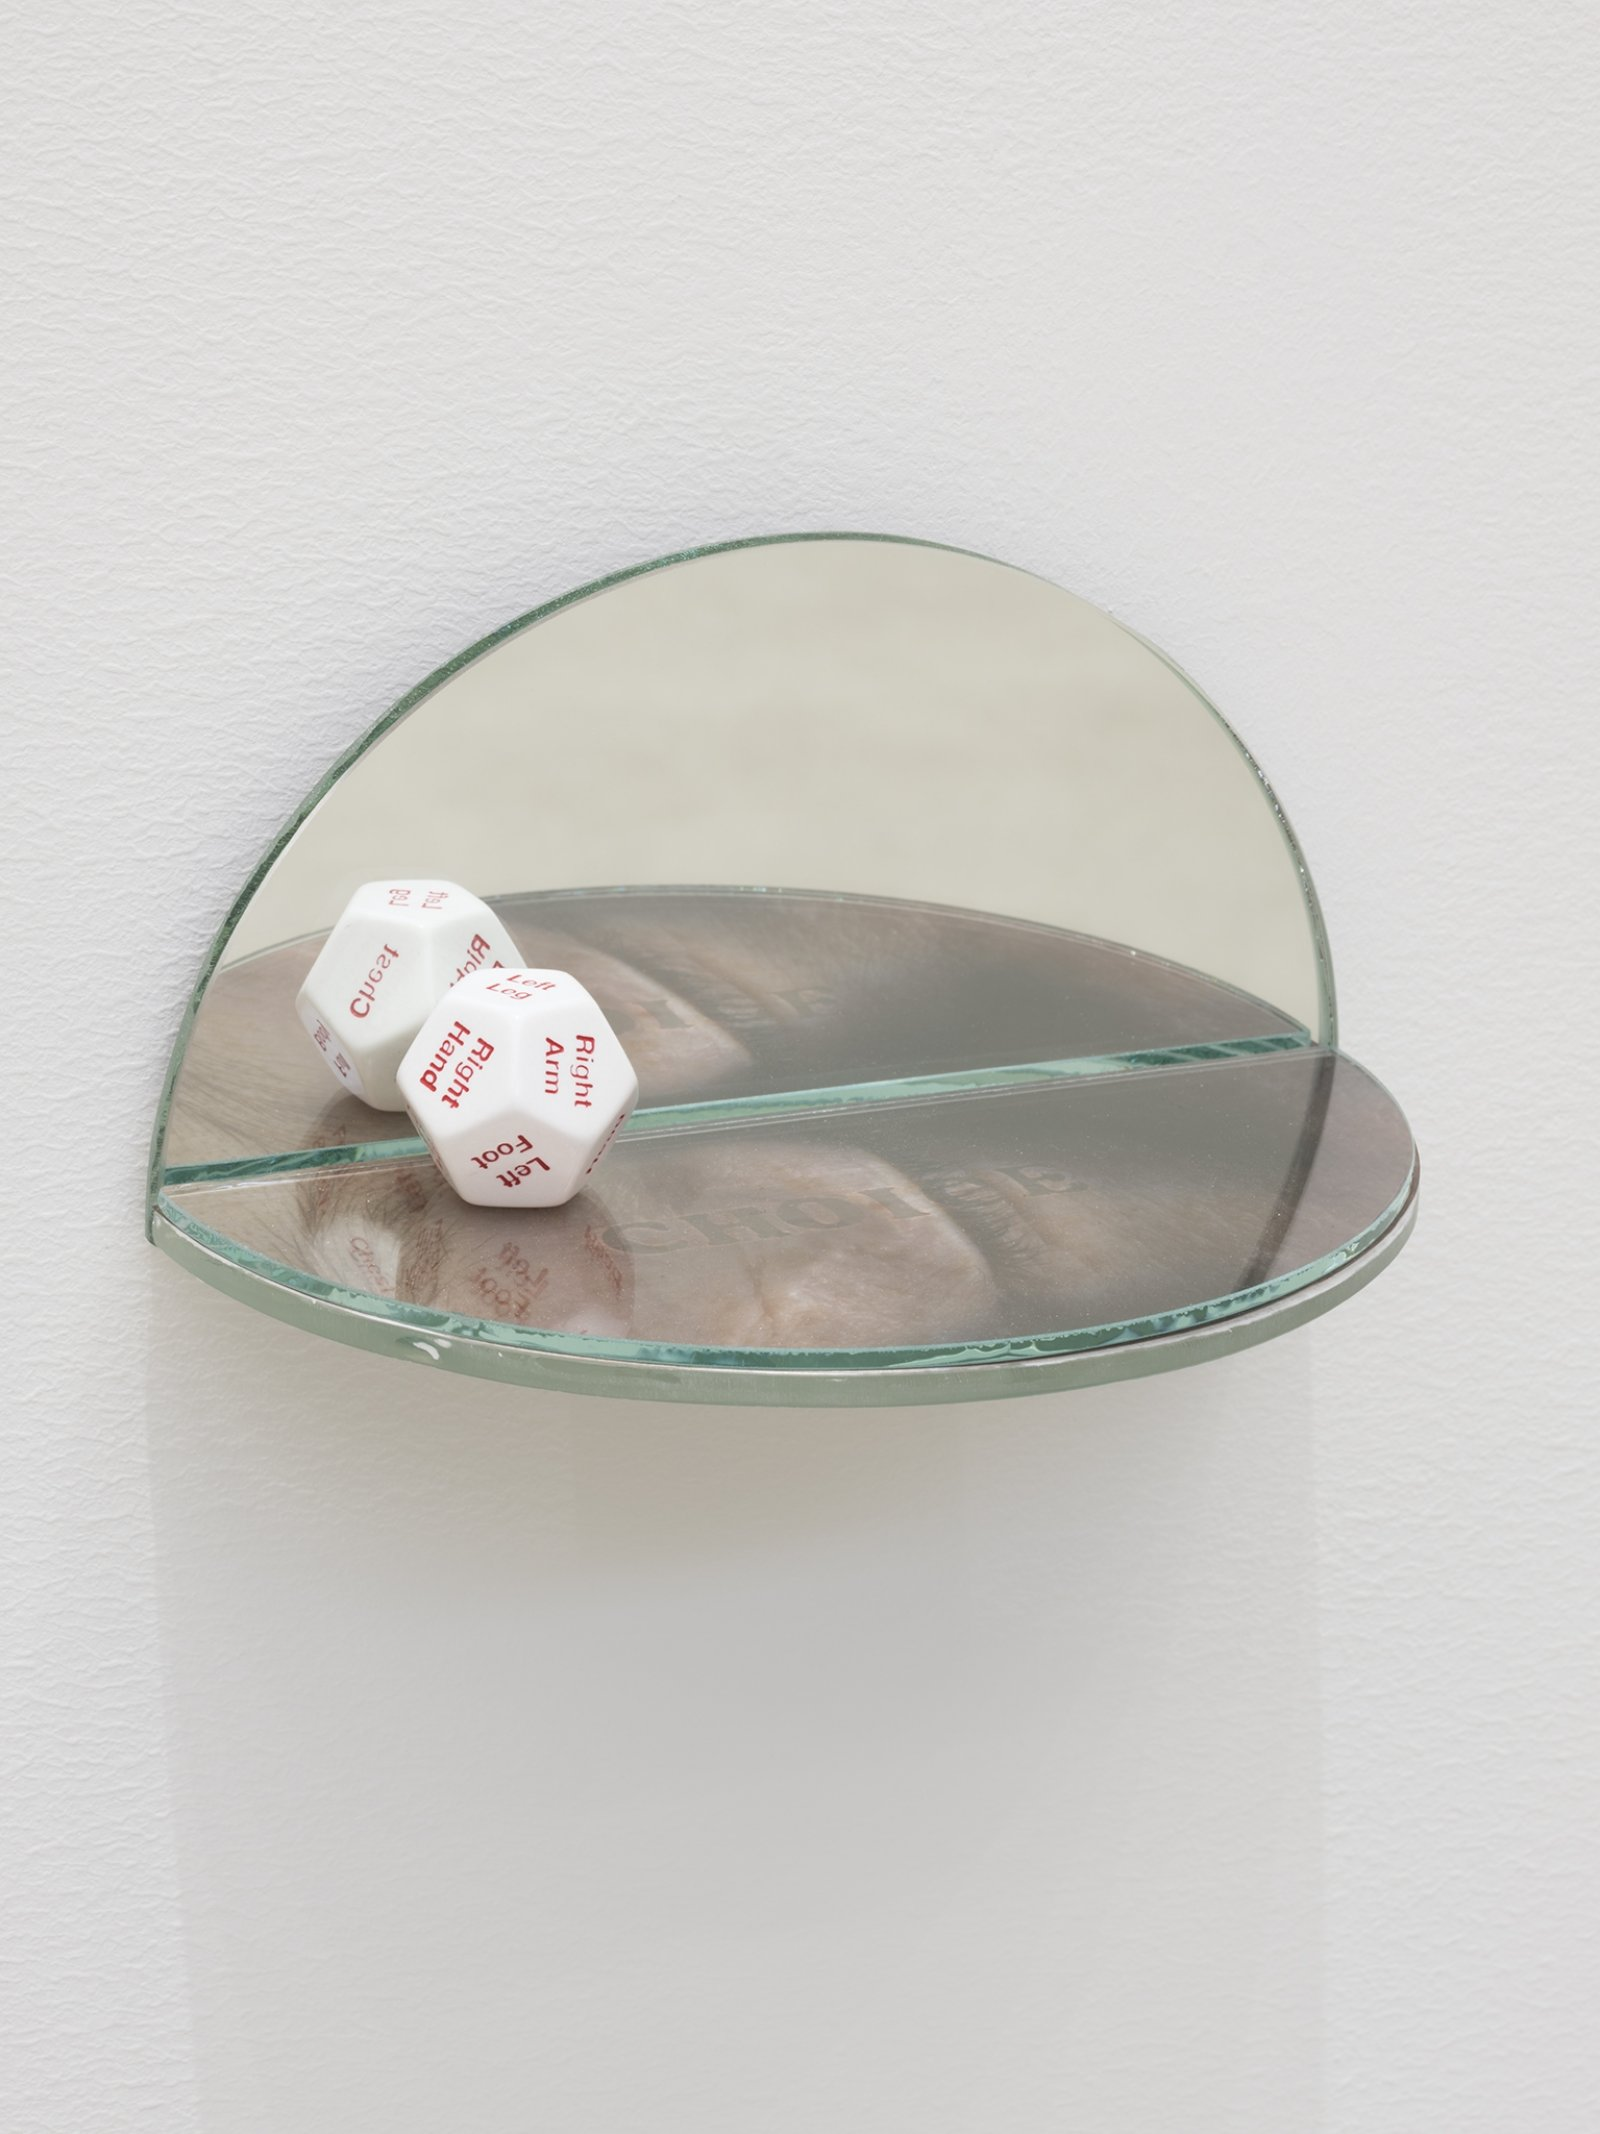 Julia Feyrer, The Ambidextrous Universe: seeing, 2018, mirror, liquid mirror, glass, fujiclear transparency, 12-sided die, 4 x 4 x 7 in. (9 x 9 x 18 cm)